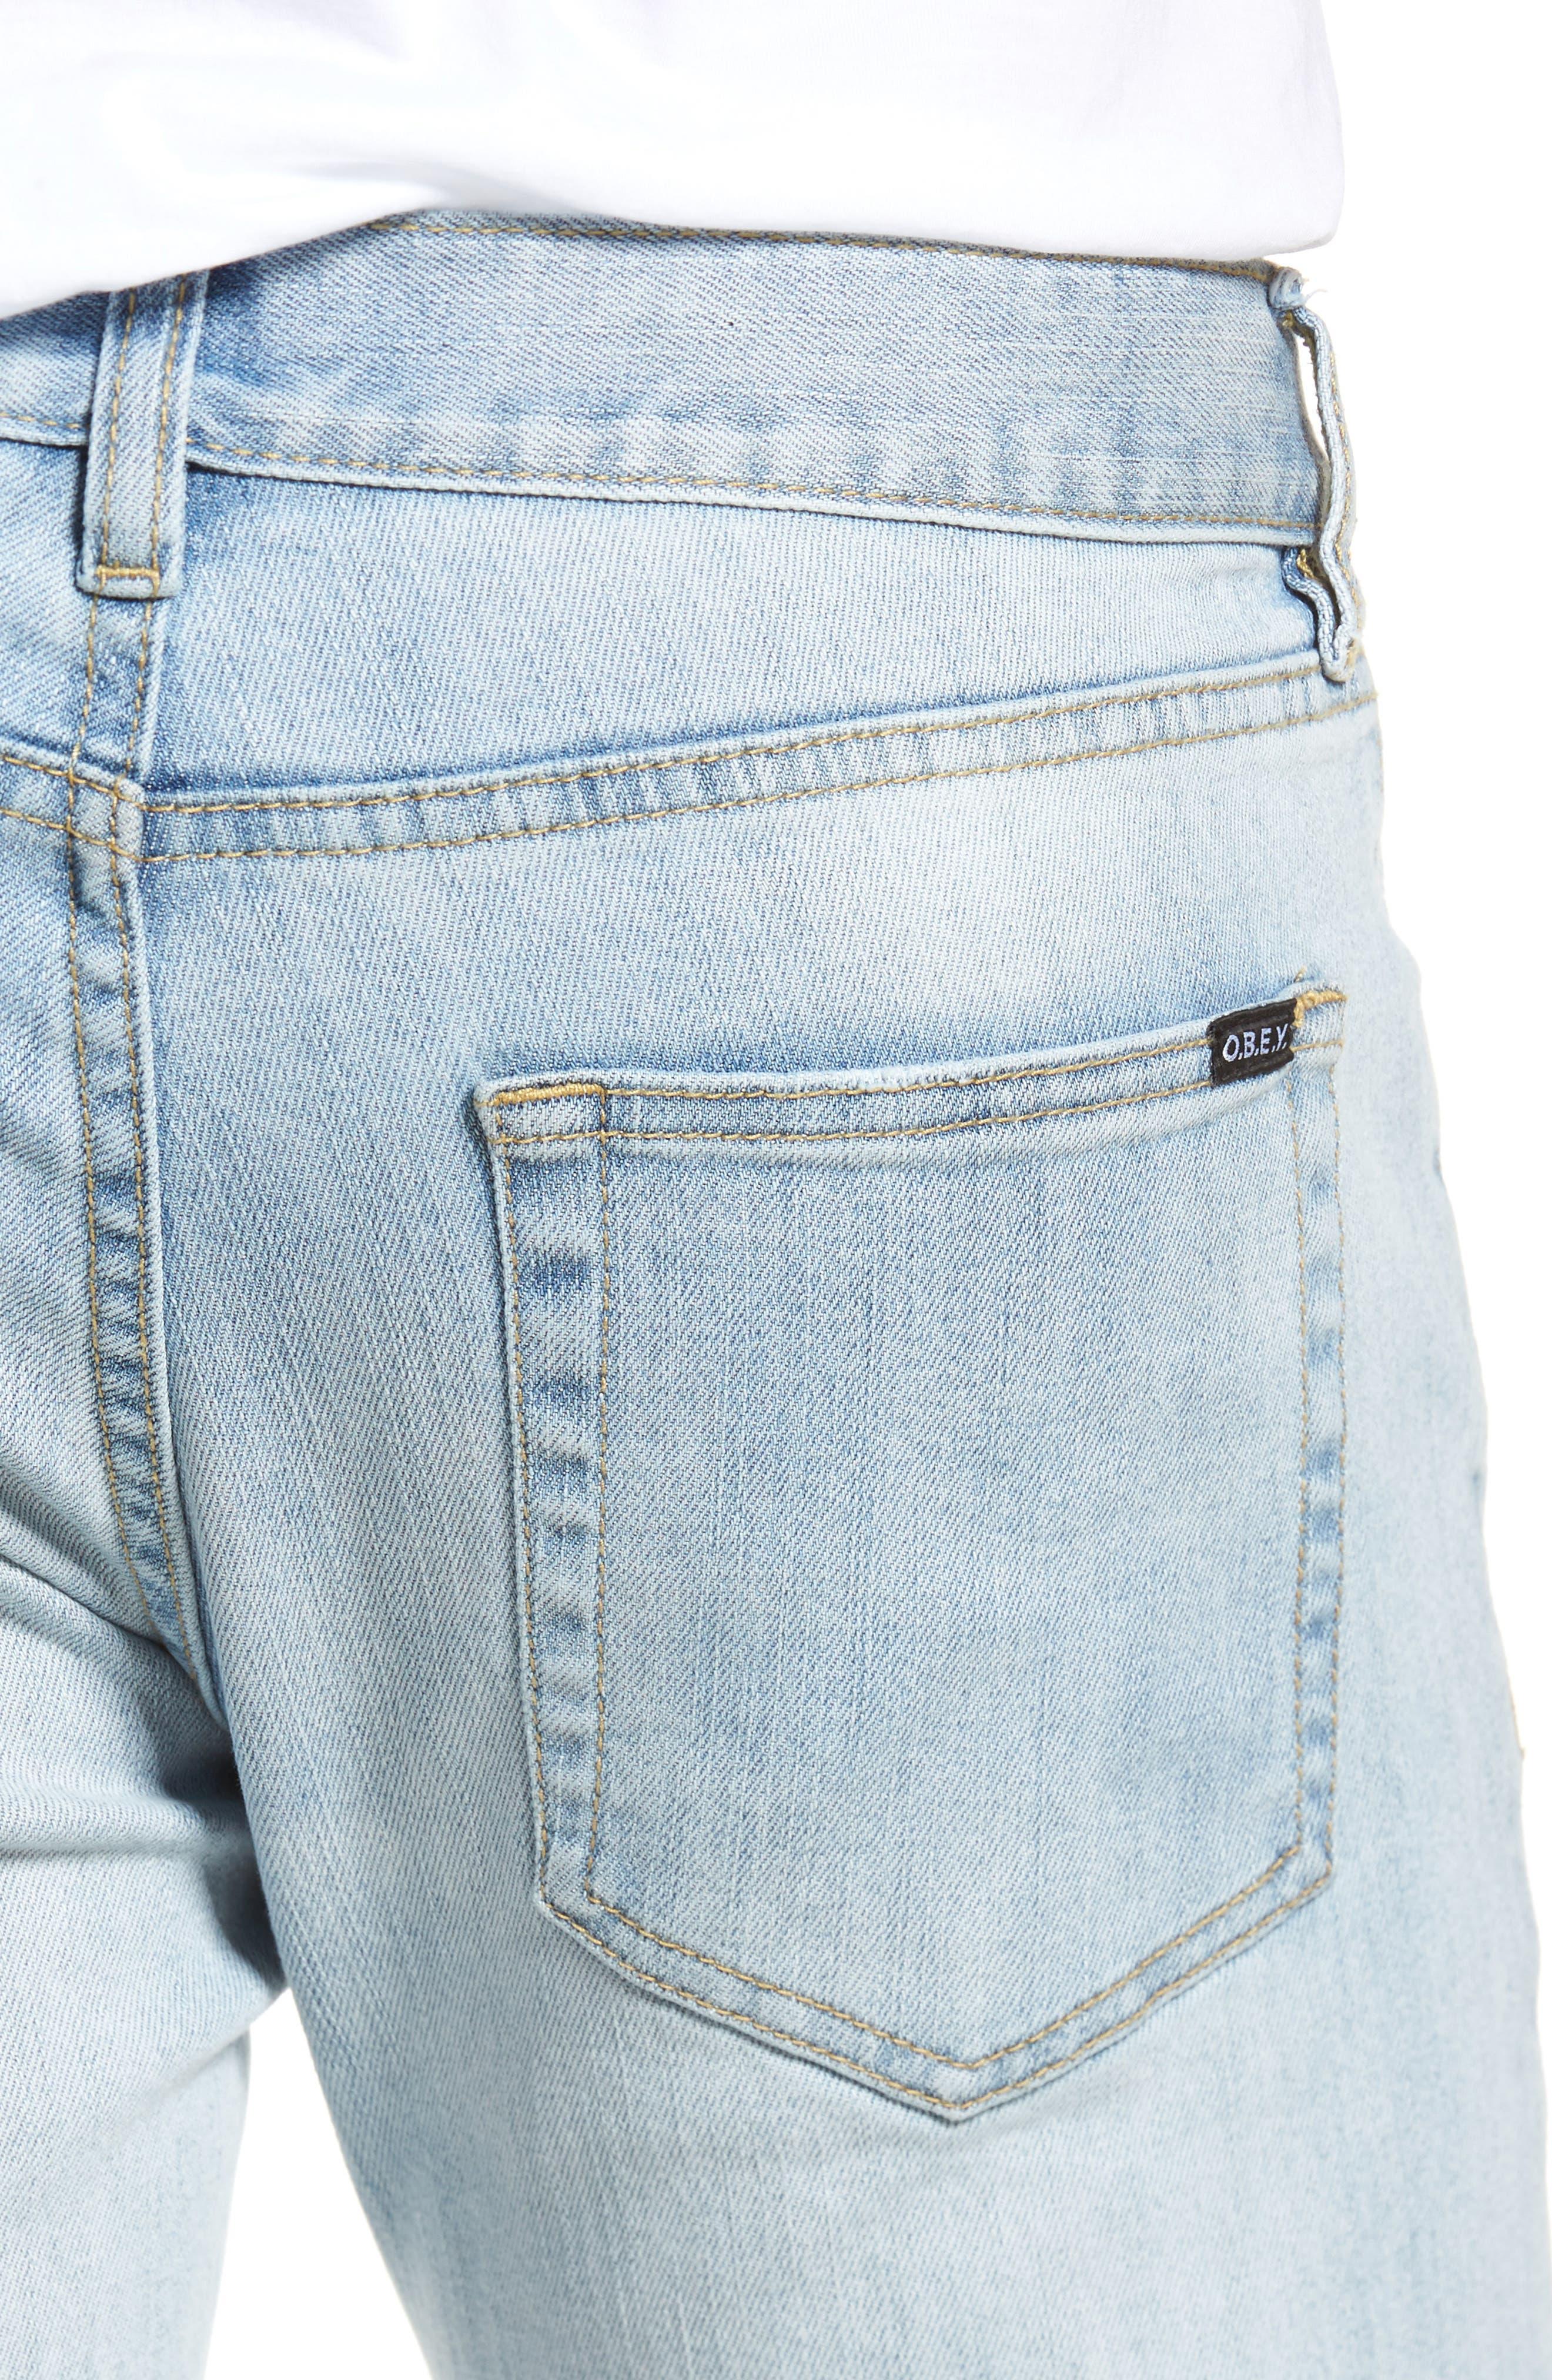 Juvee II Skinny Fit Jeans,                             Alternate thumbnail 4, color,                             400